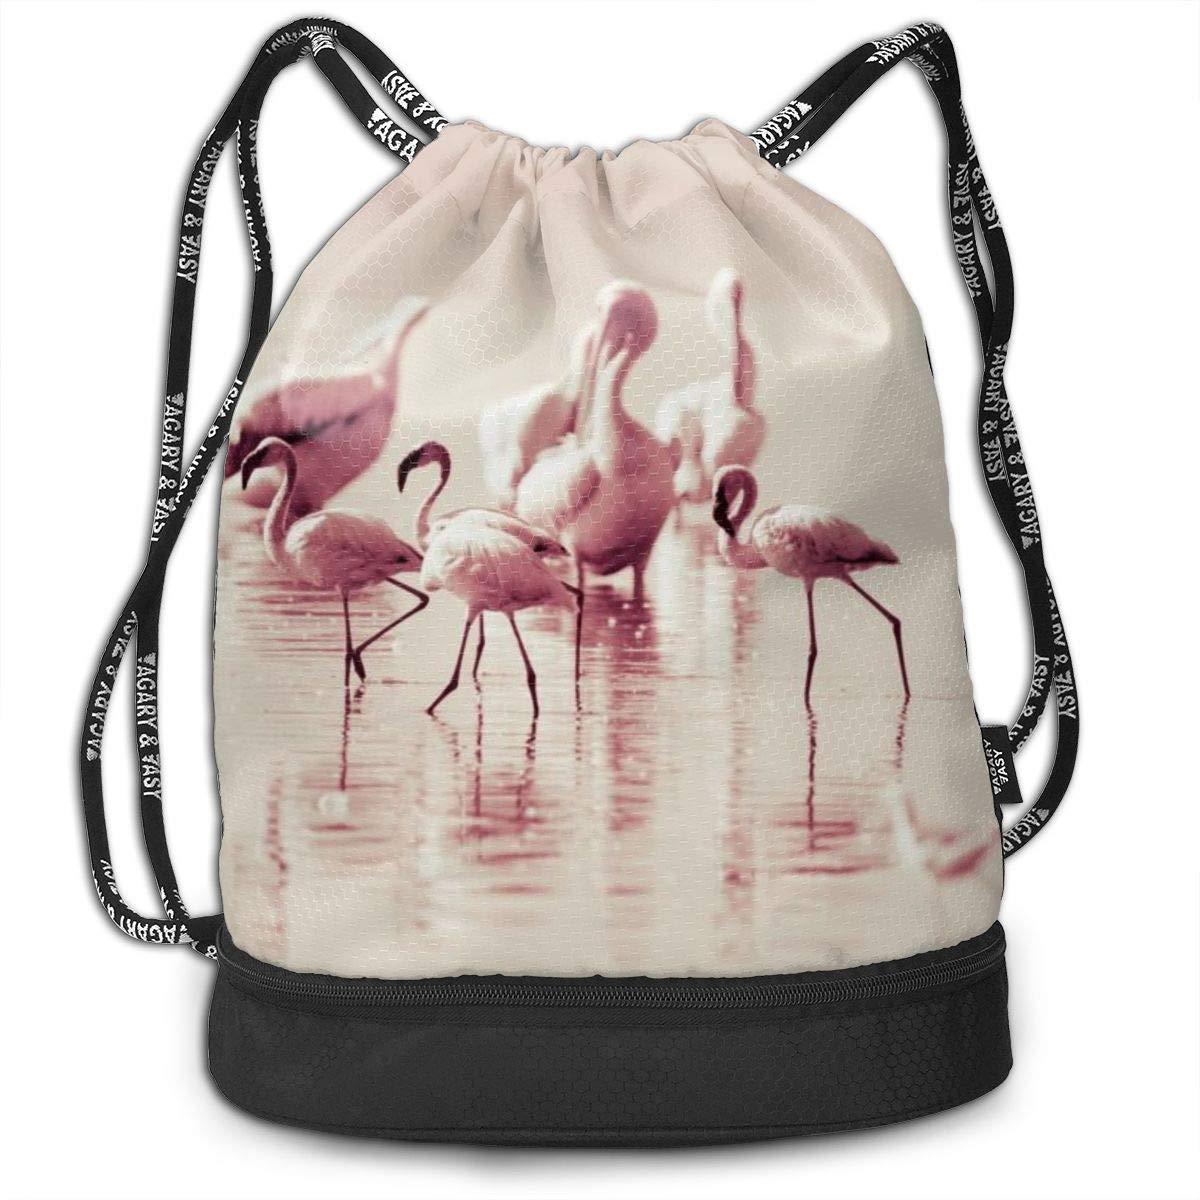 Kji Gym Sack Drawstring Bag Flamingo Picture Printed Sackpack Sport Cinch Pack Backpack for Men Women